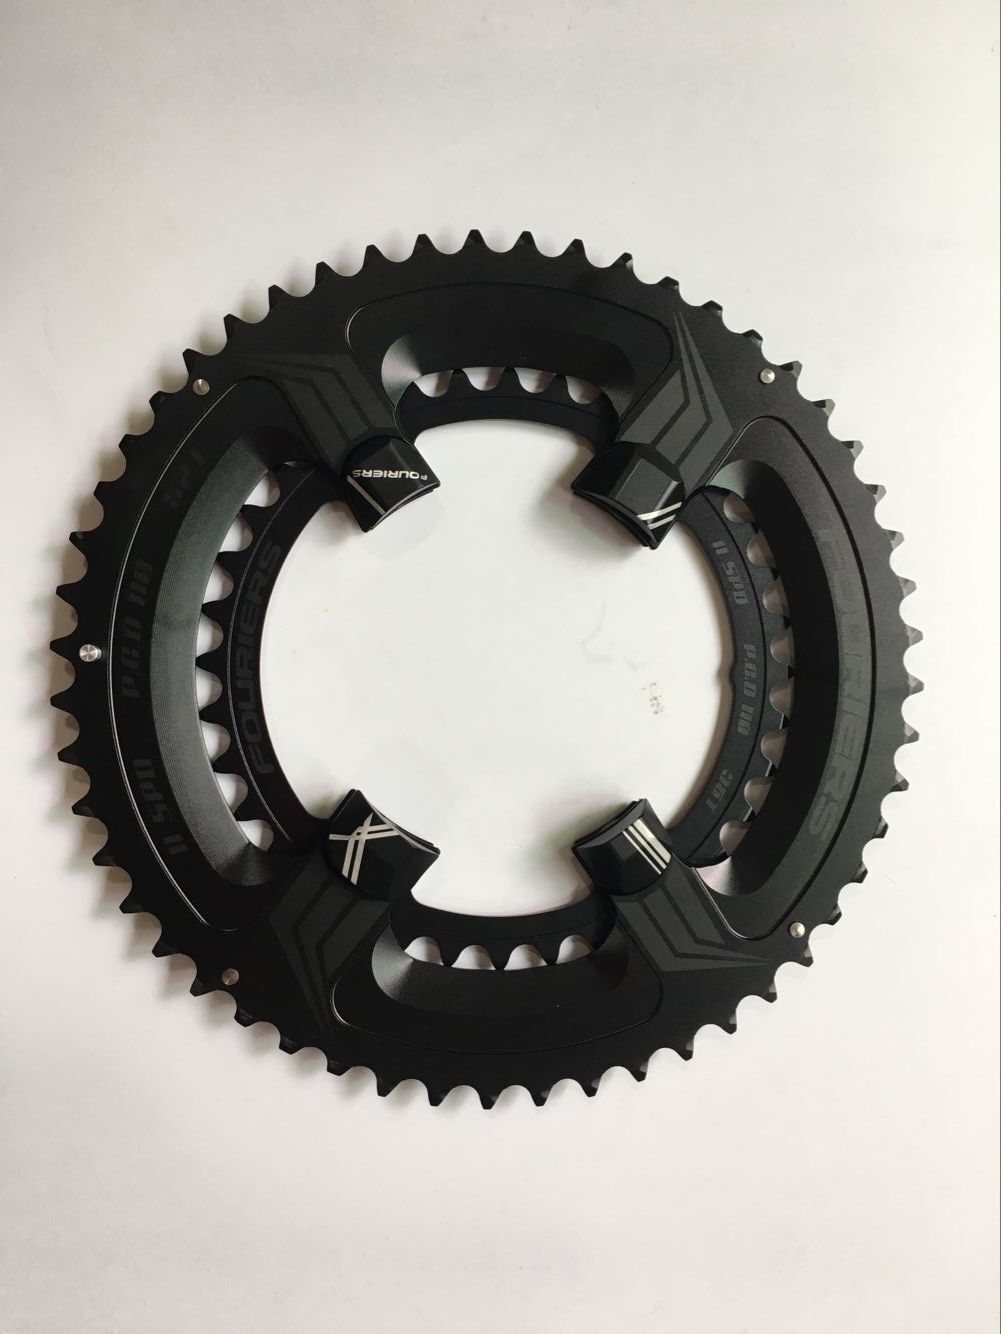 Fouriers BCD110 Doble Bicicleta 34 50T Plato Para Shimano 5800 6800 Manivela Negro